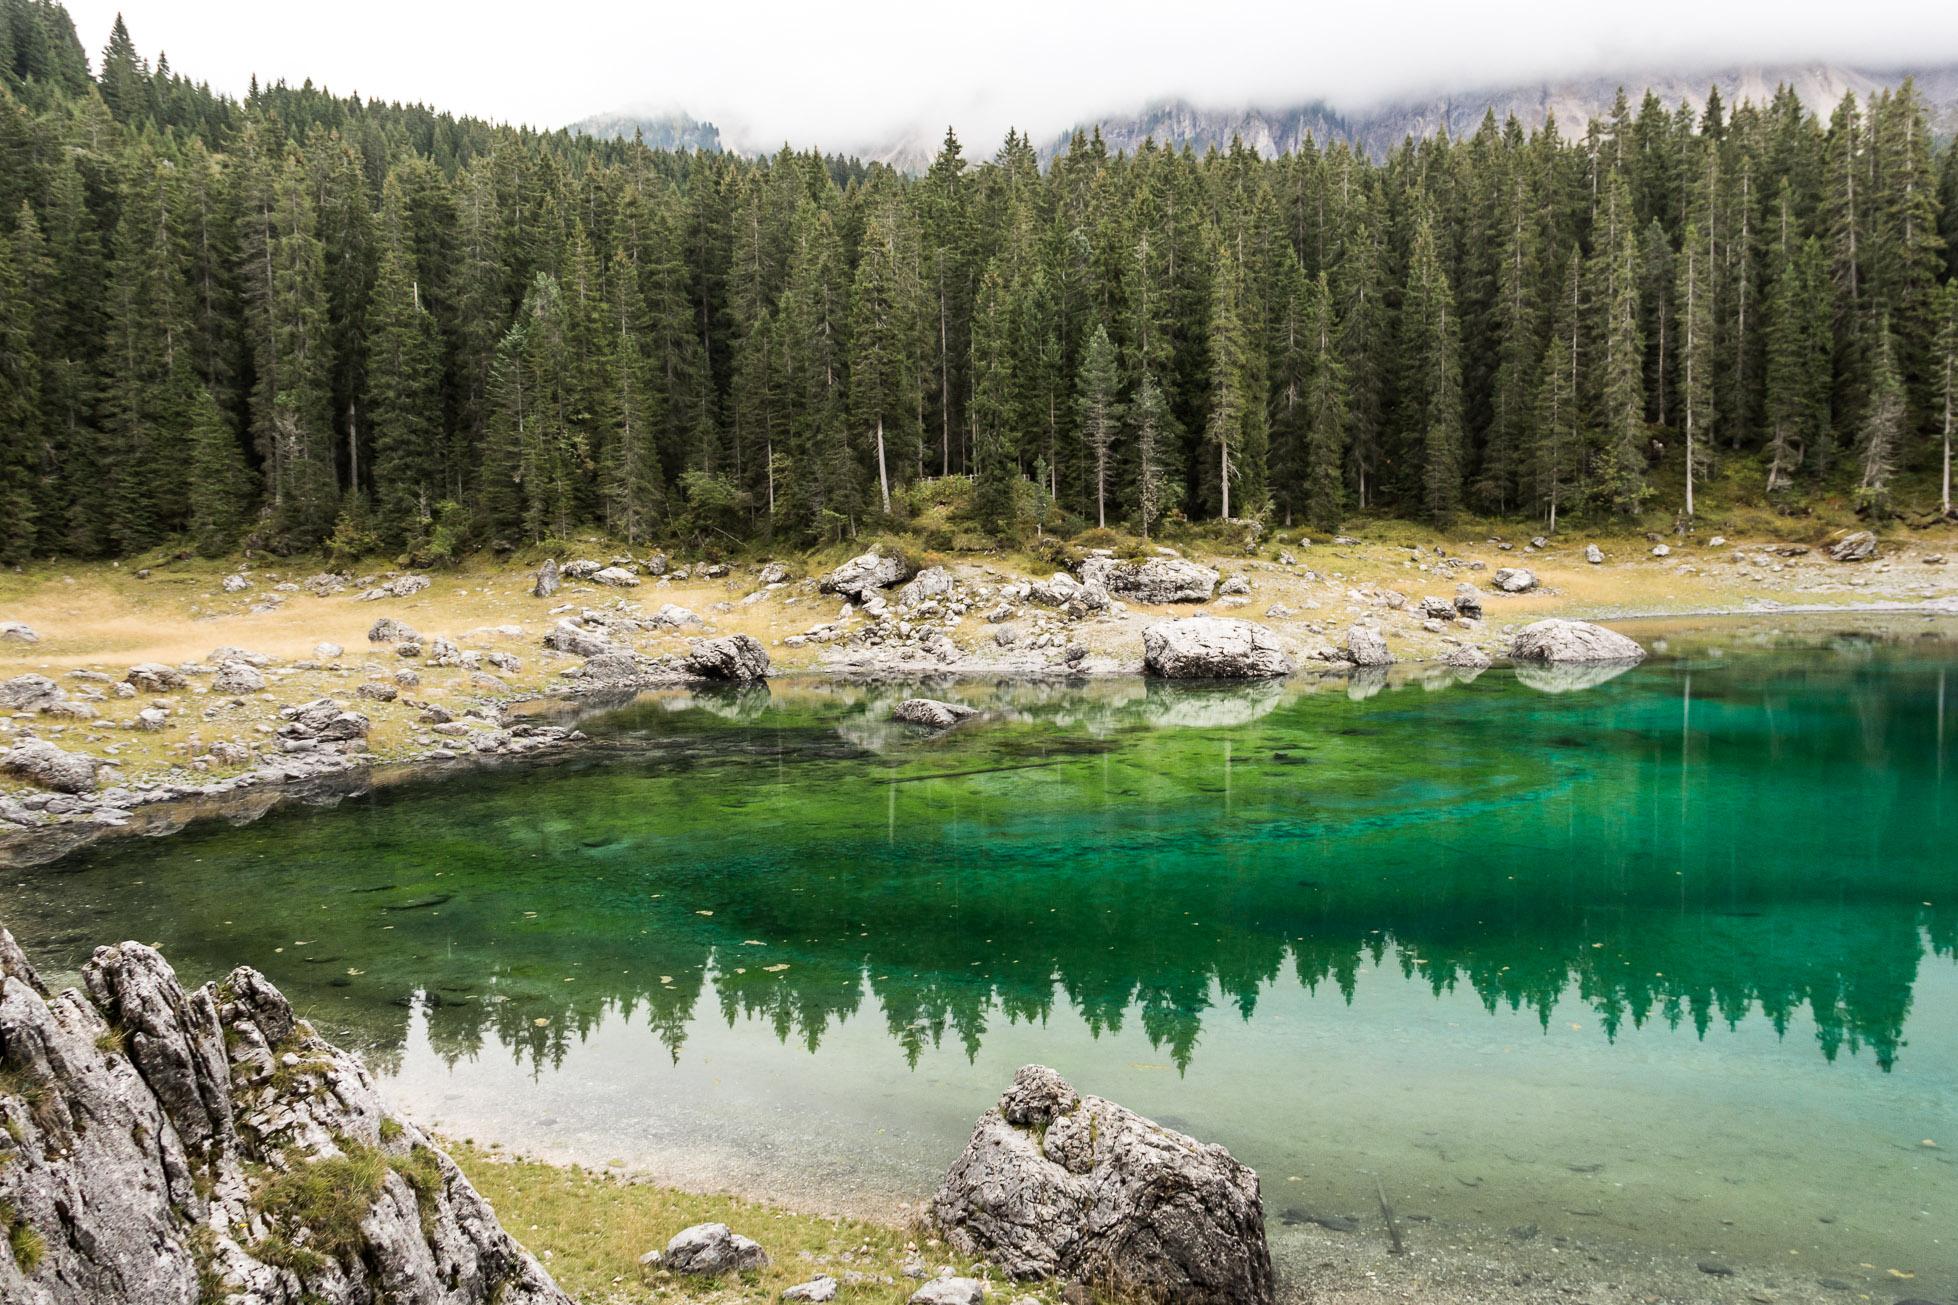 Le Lago di Carezza ou Karersee, dans le Dolomites